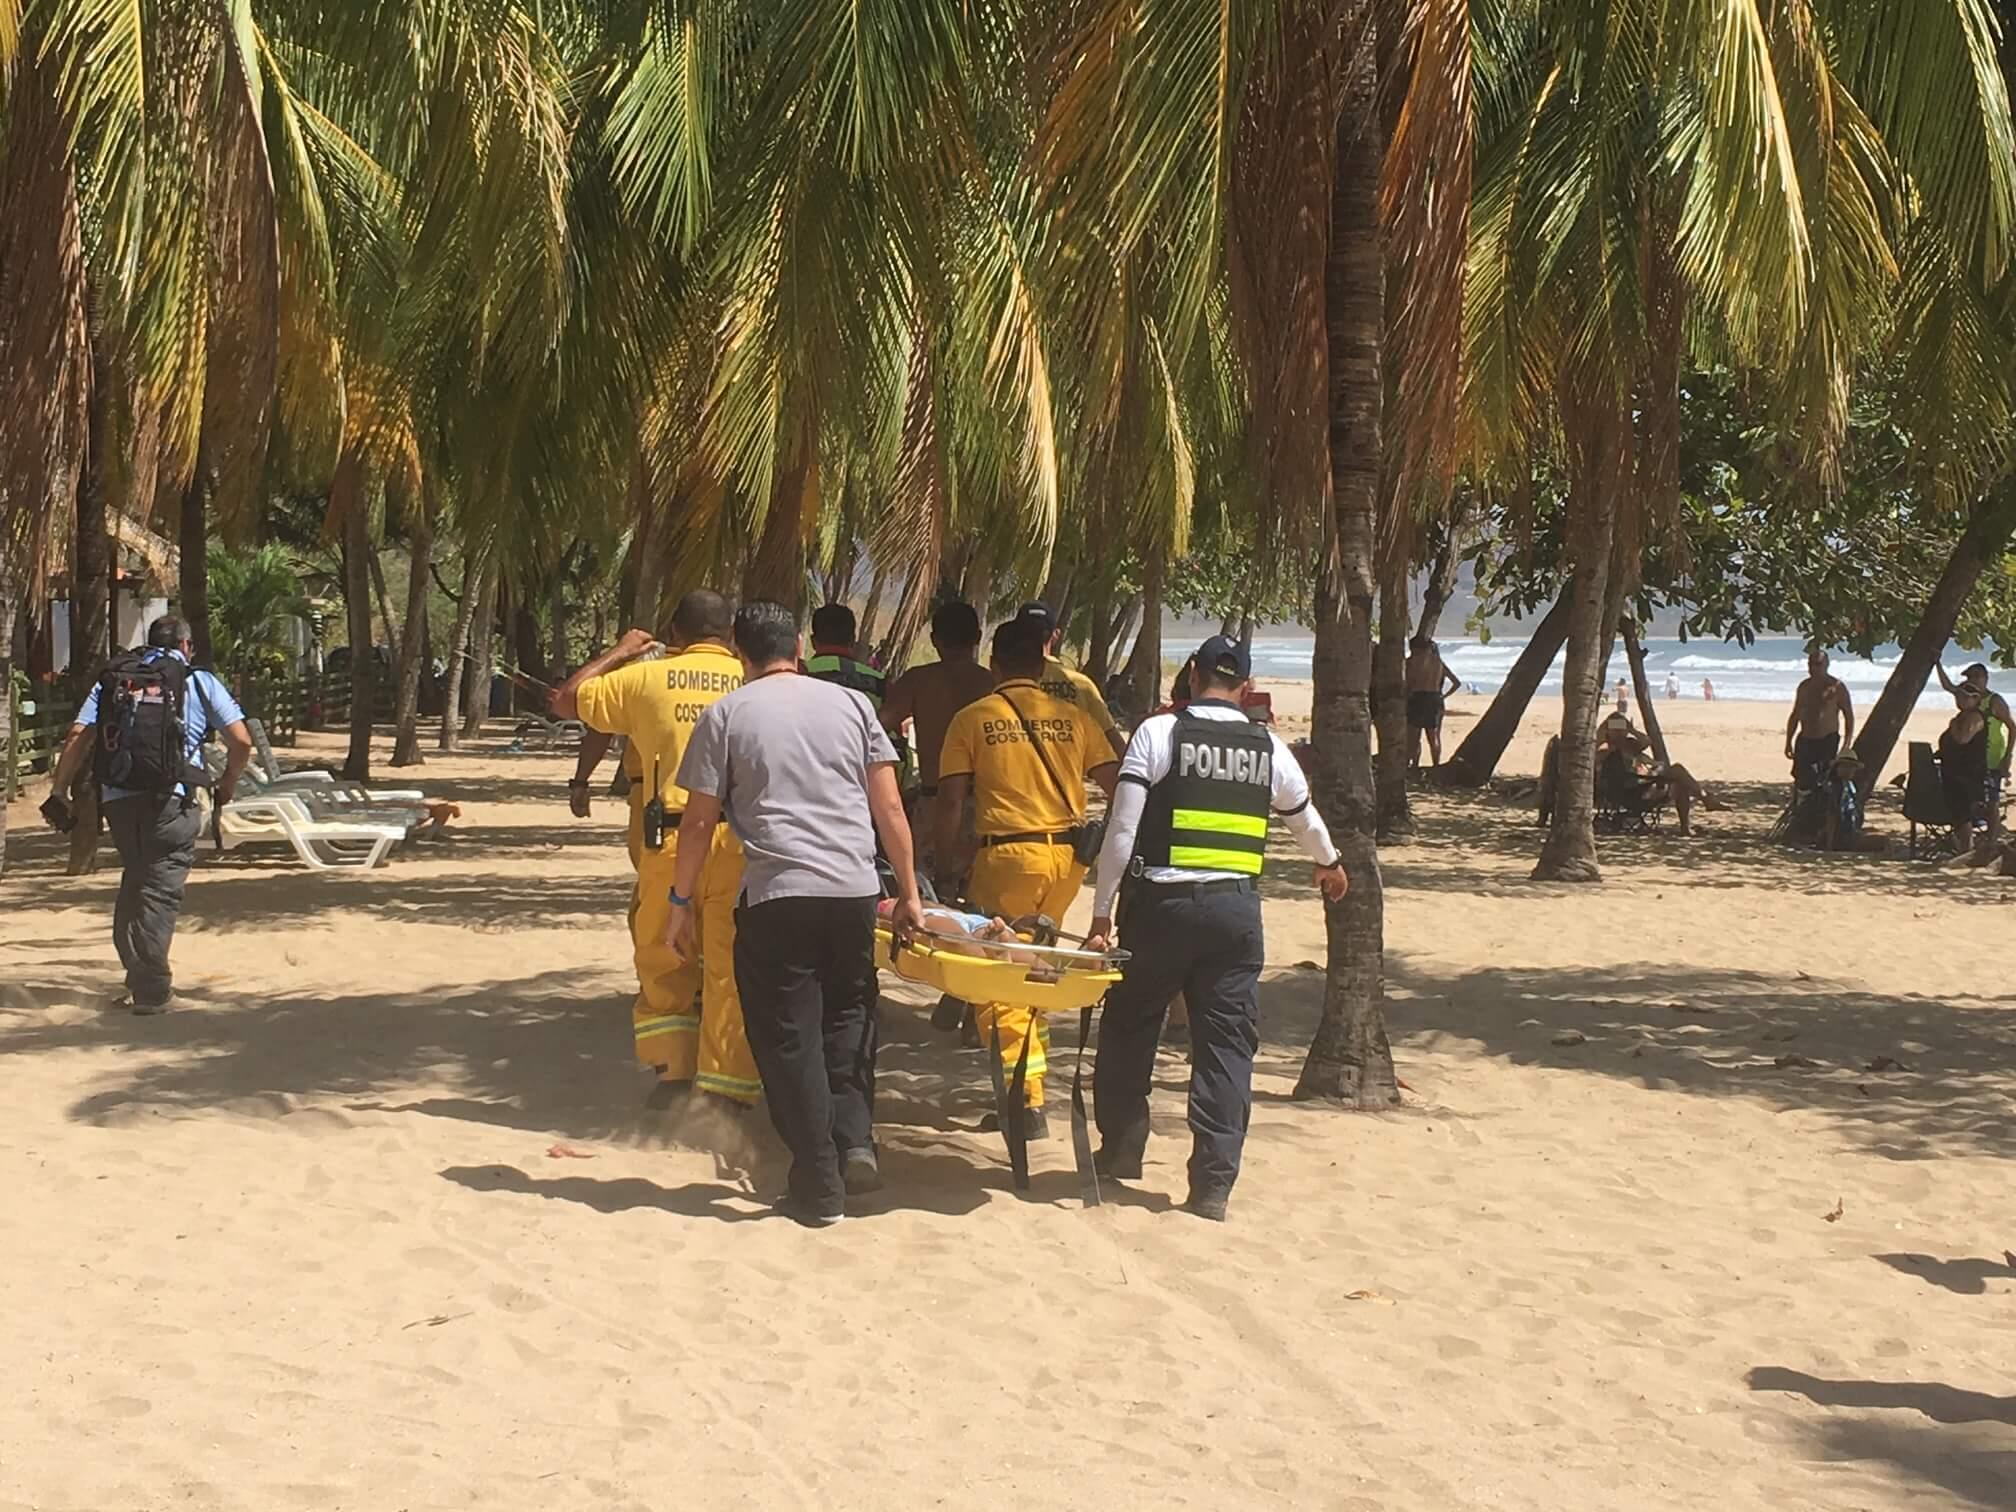 playa grande pediatric drowning, costa rica